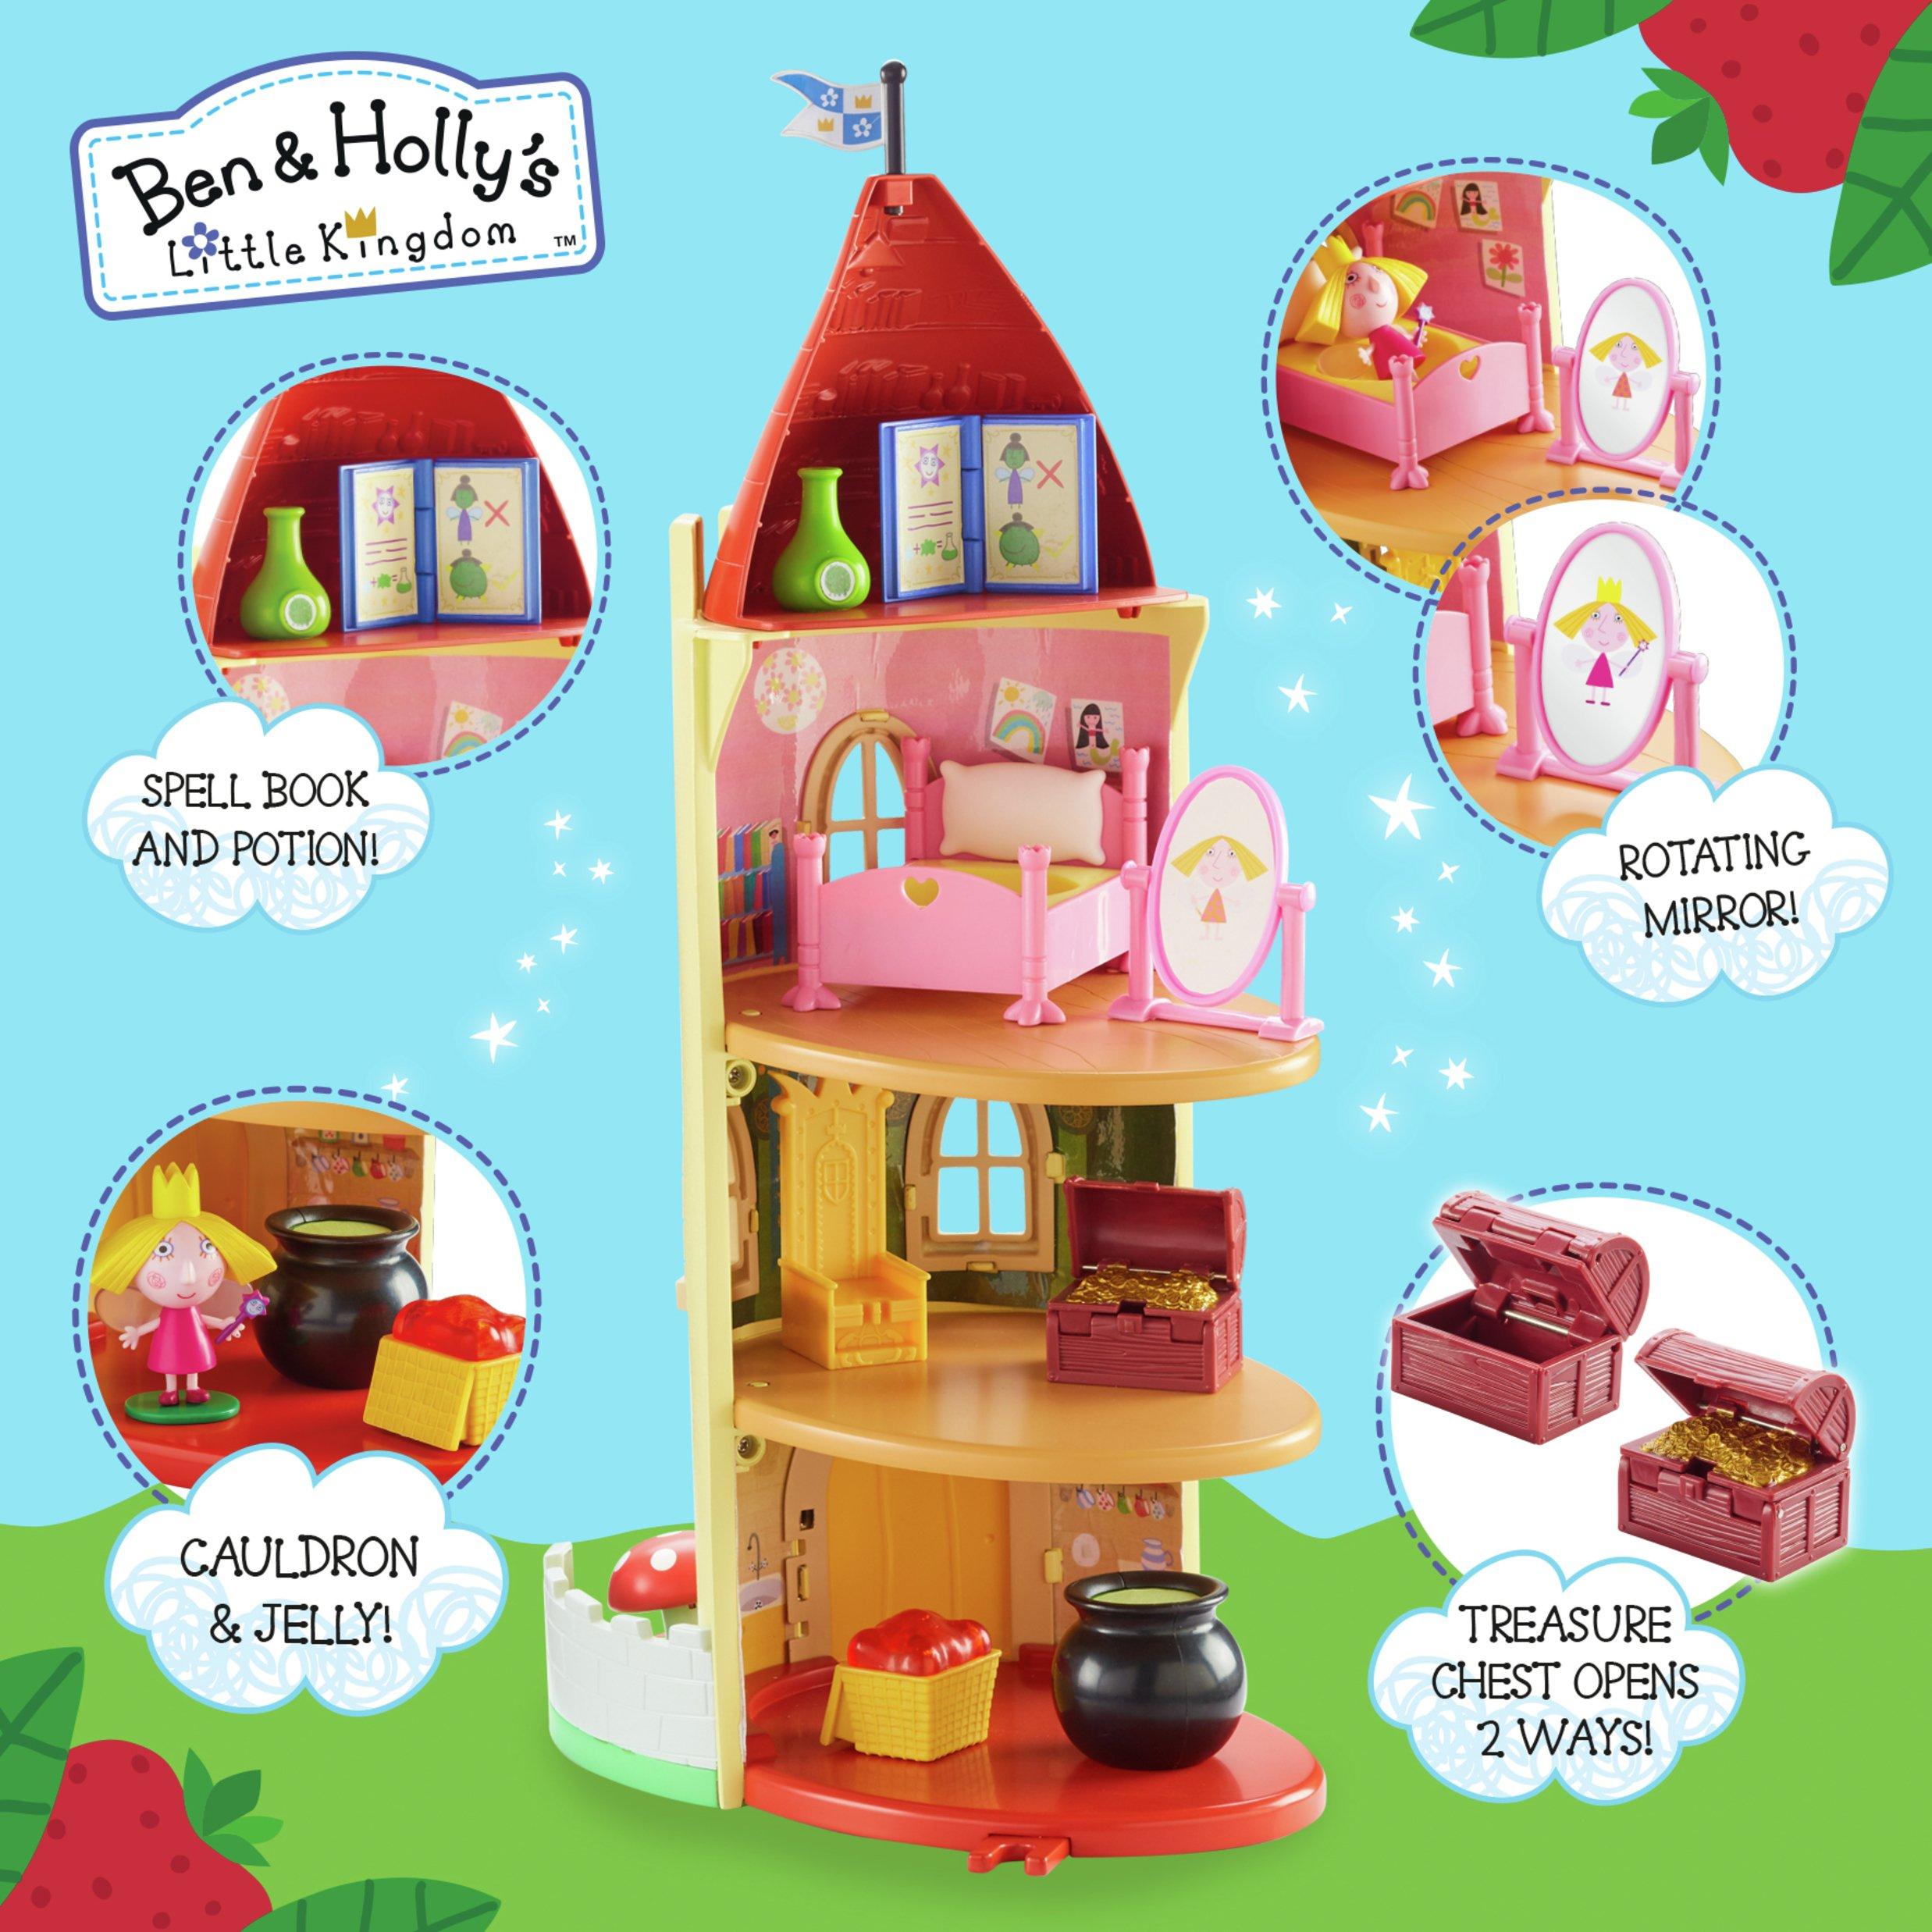 Ben & Holly's Little Kingdom Thistle Castle Playset